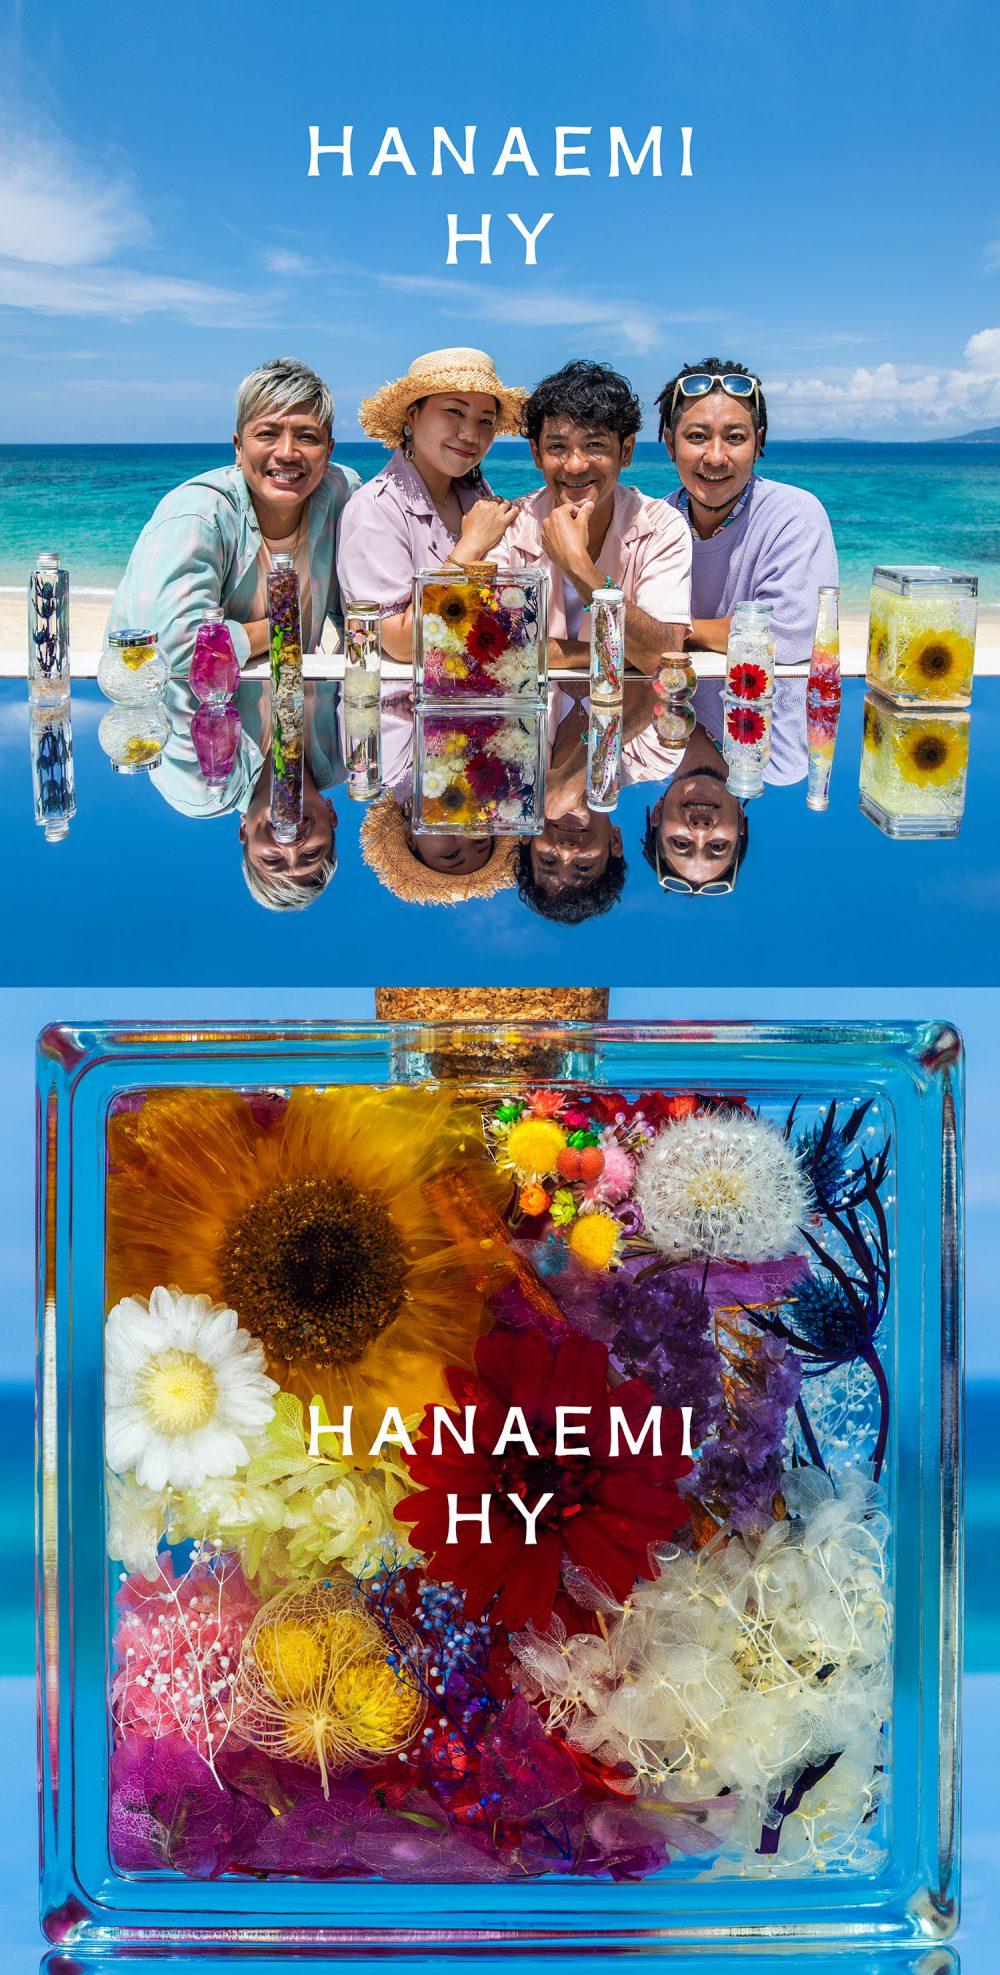 HY / HANAEMI